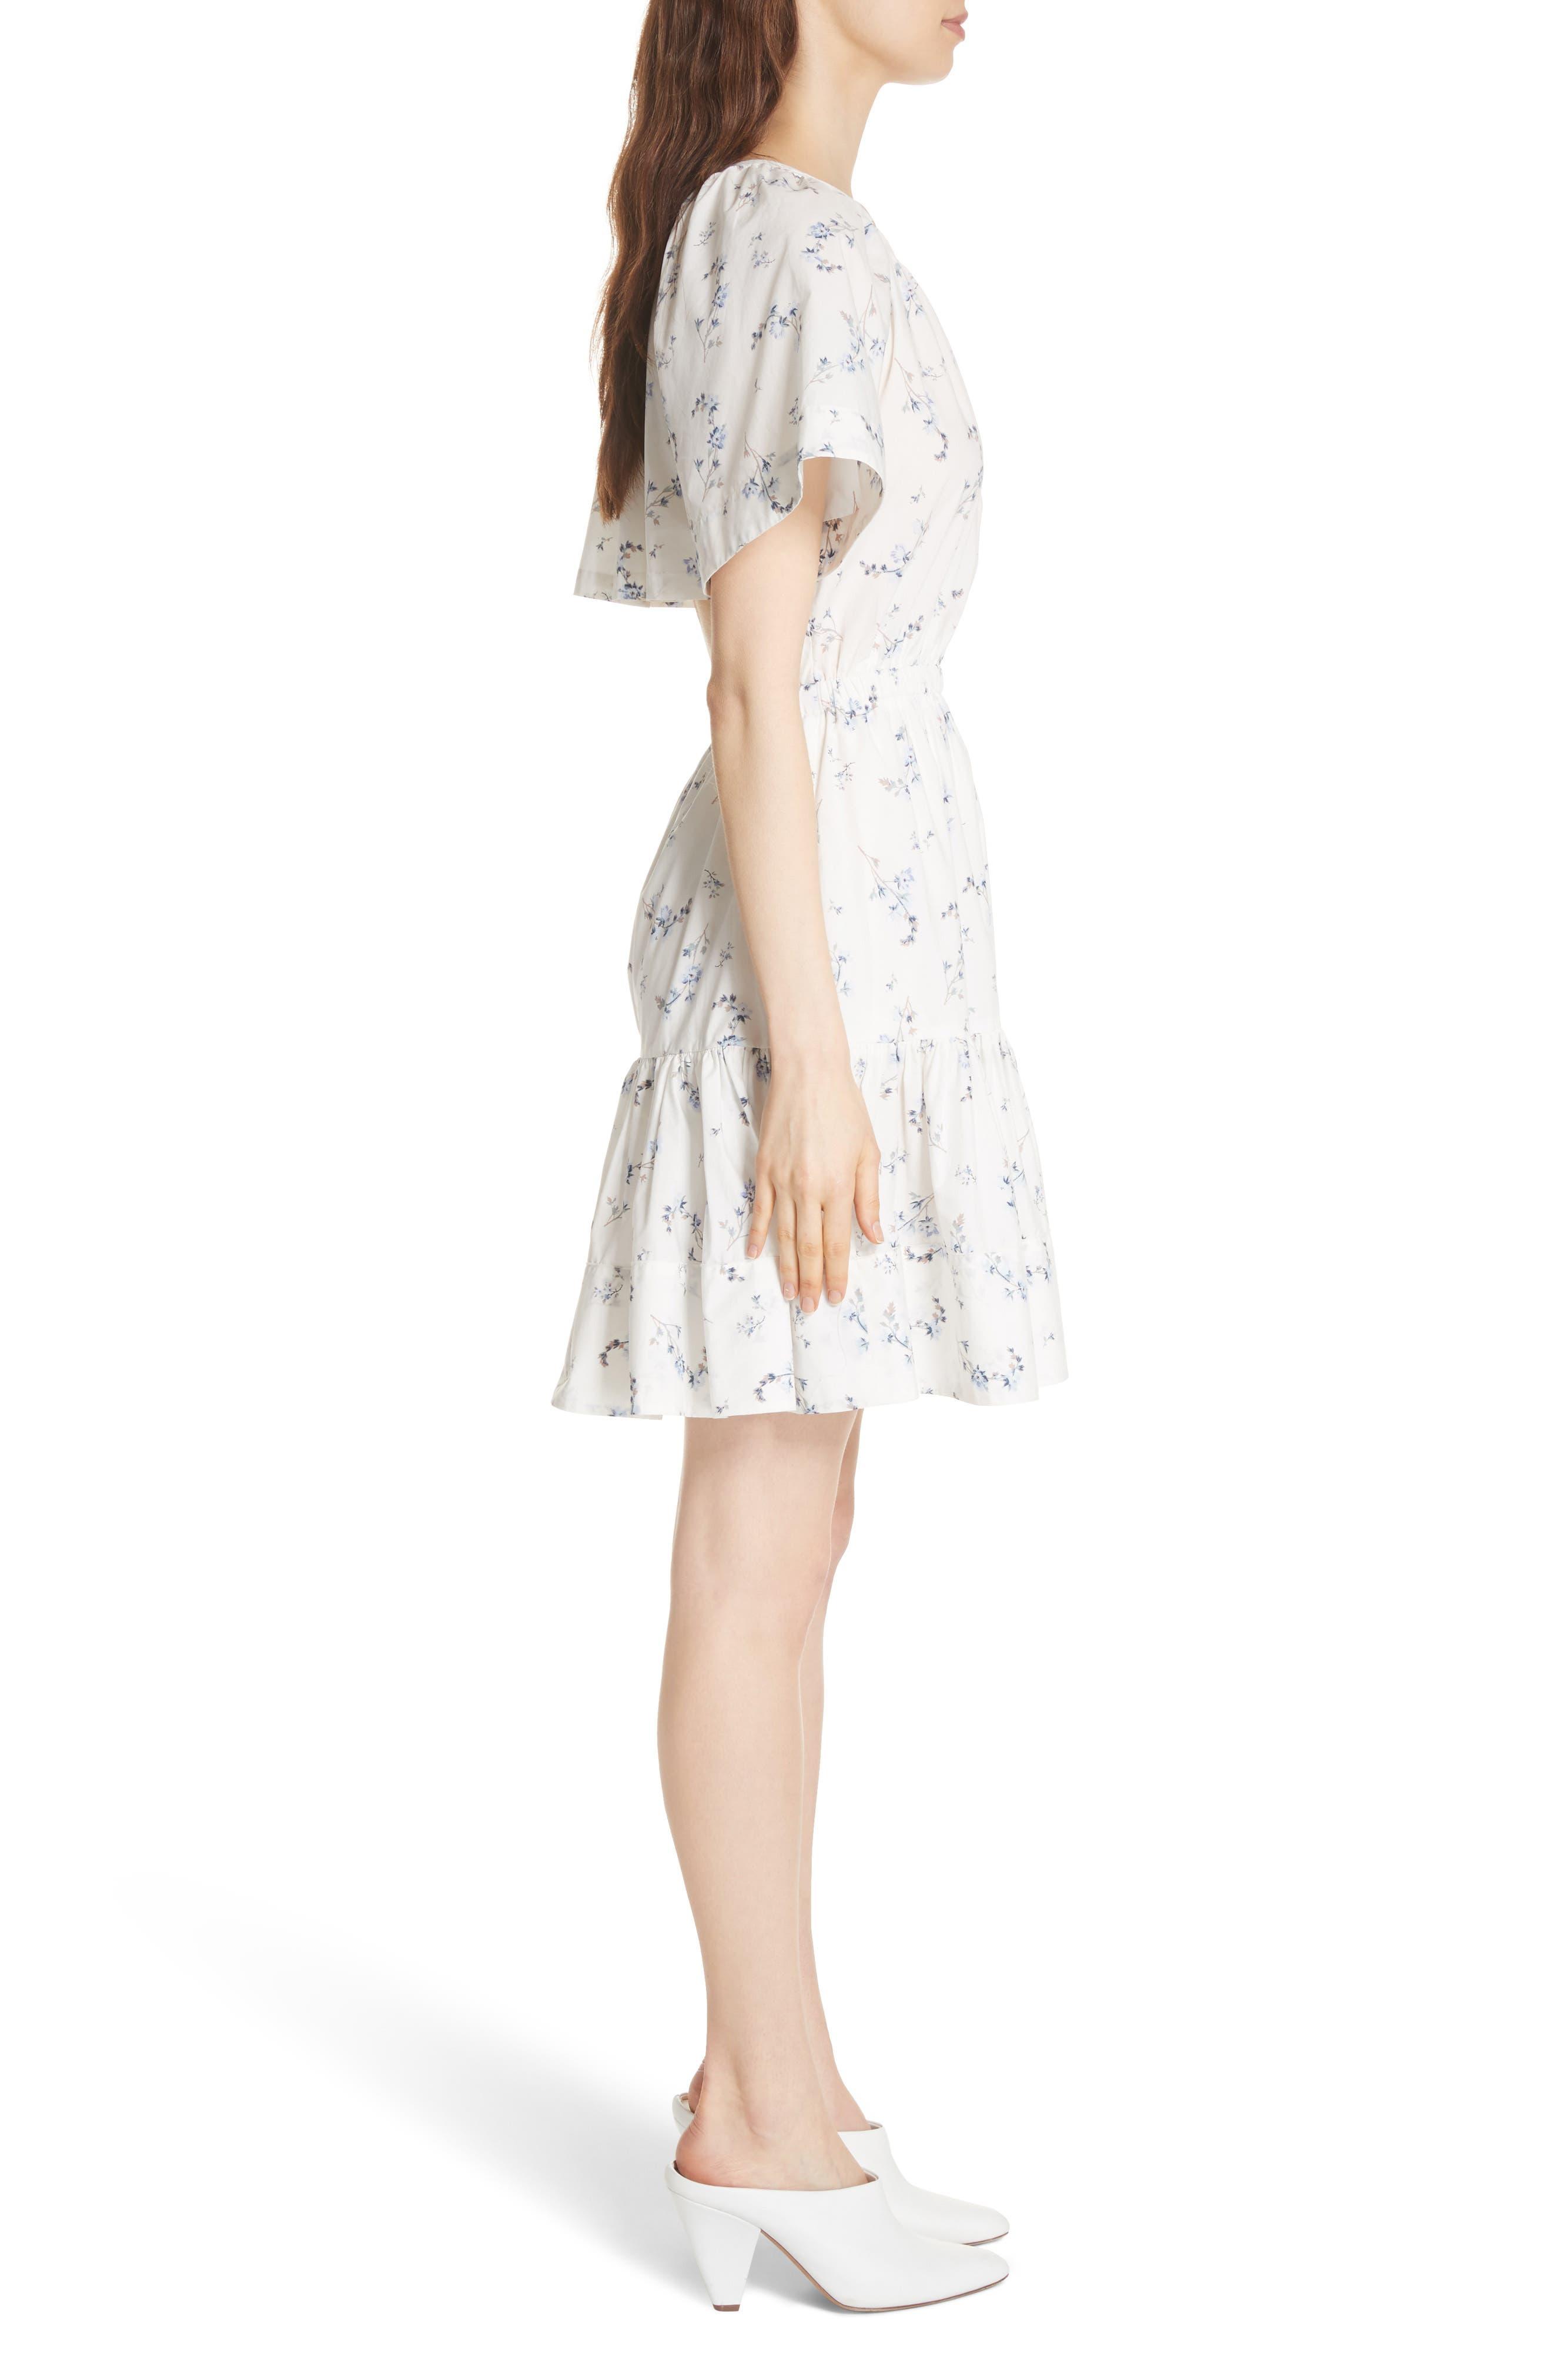 Francine Back Cutout Mini Dress,                             Alternate thumbnail 3, color,                             103